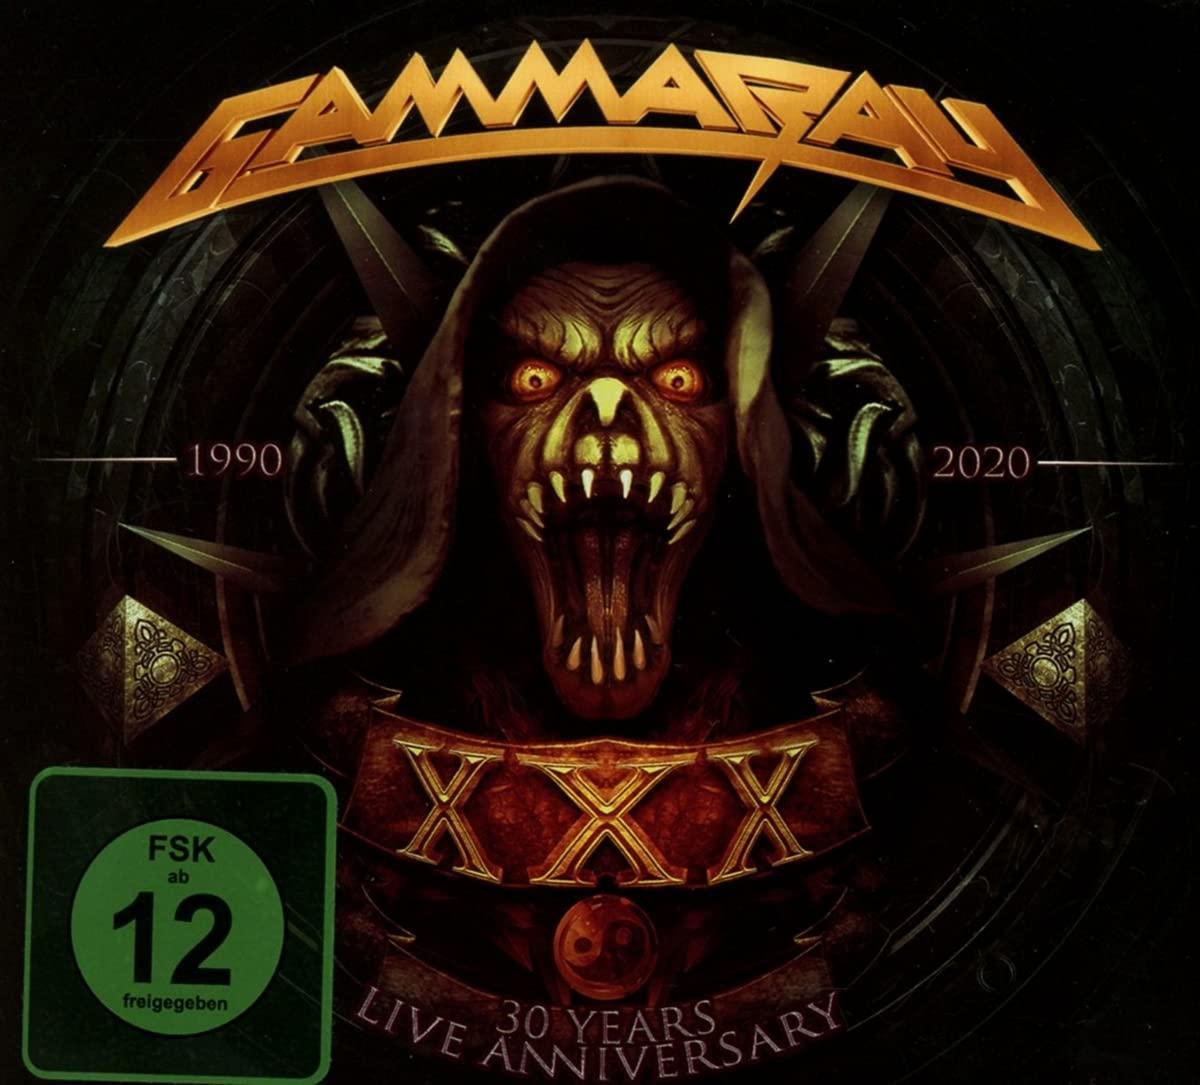 Gamma Ray - 30 Years Live Anniversary (2021) [FLAC] Download